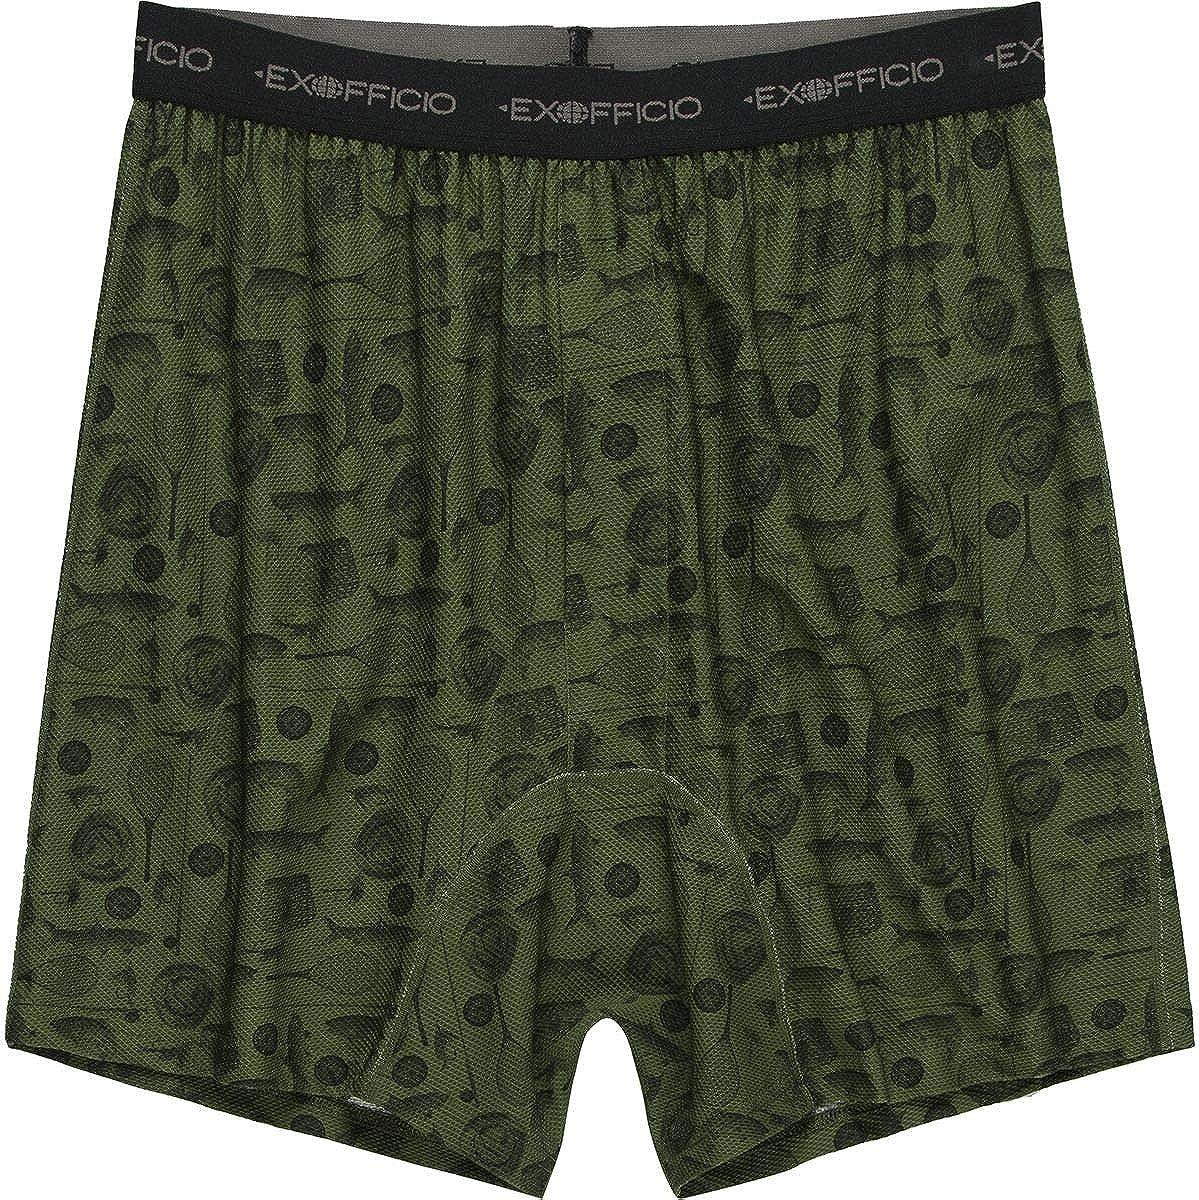 ExOfficio Men's GNG Printed Boxer - Alpine Green Fly Fishing - Medium